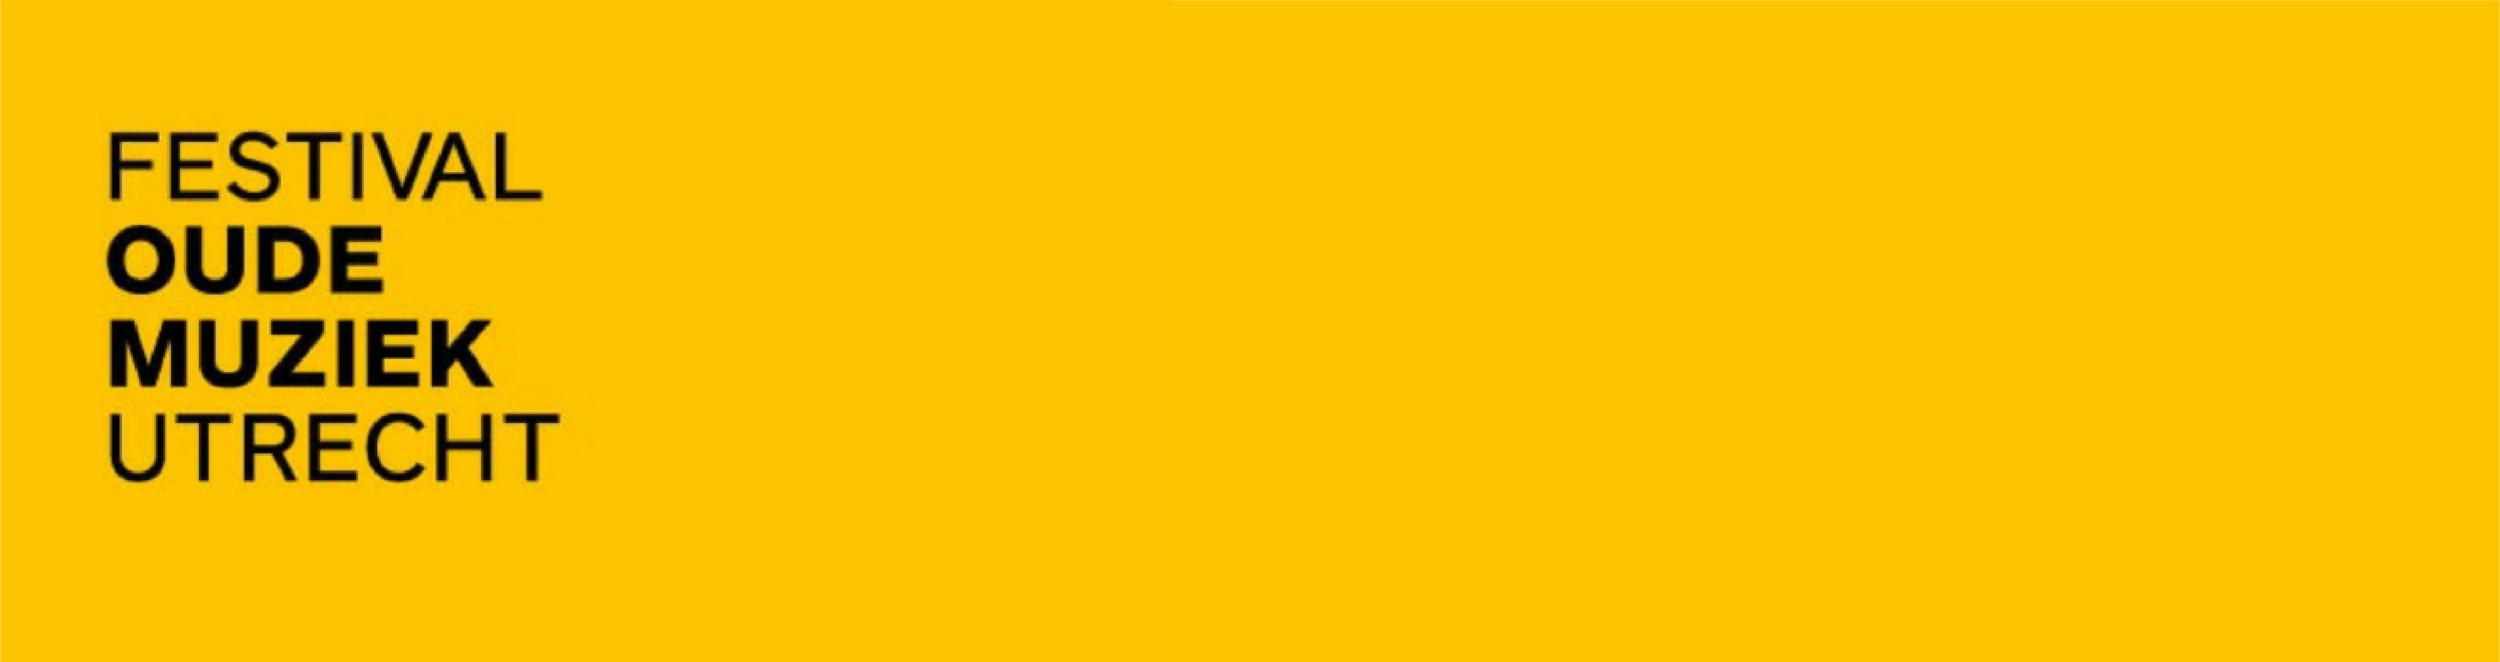 amarillo-01.png